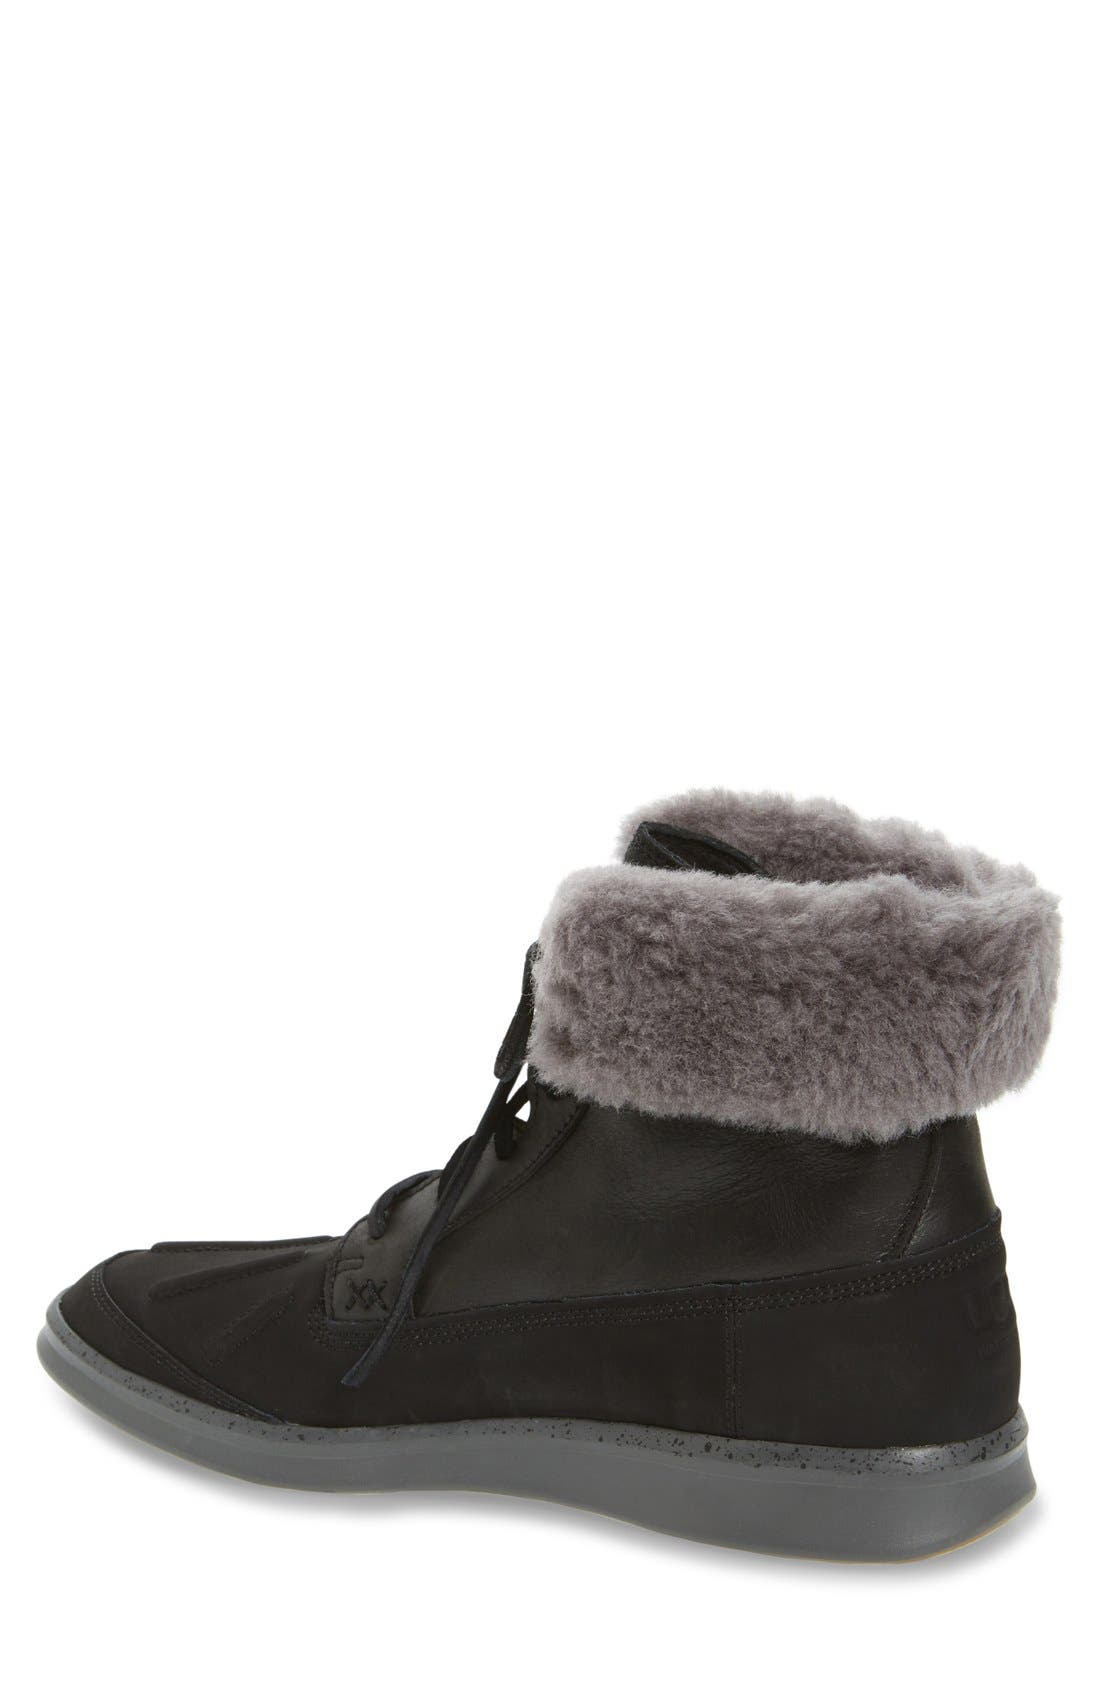 Roskoe Snow Boot,                             Alternate thumbnail 2, color,                             Black